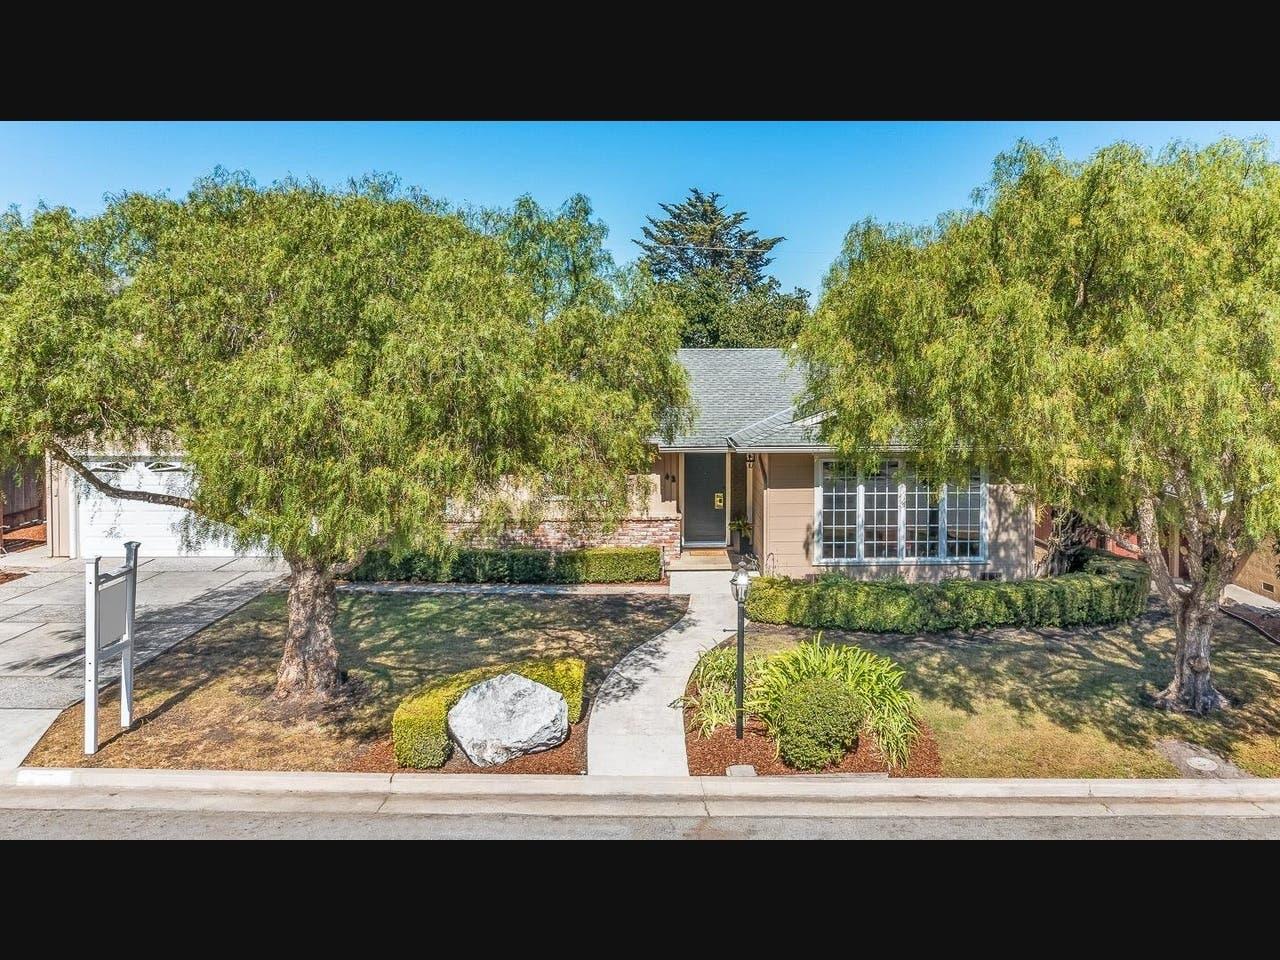 5 Santa Cruz Area Upcoming Open Houses